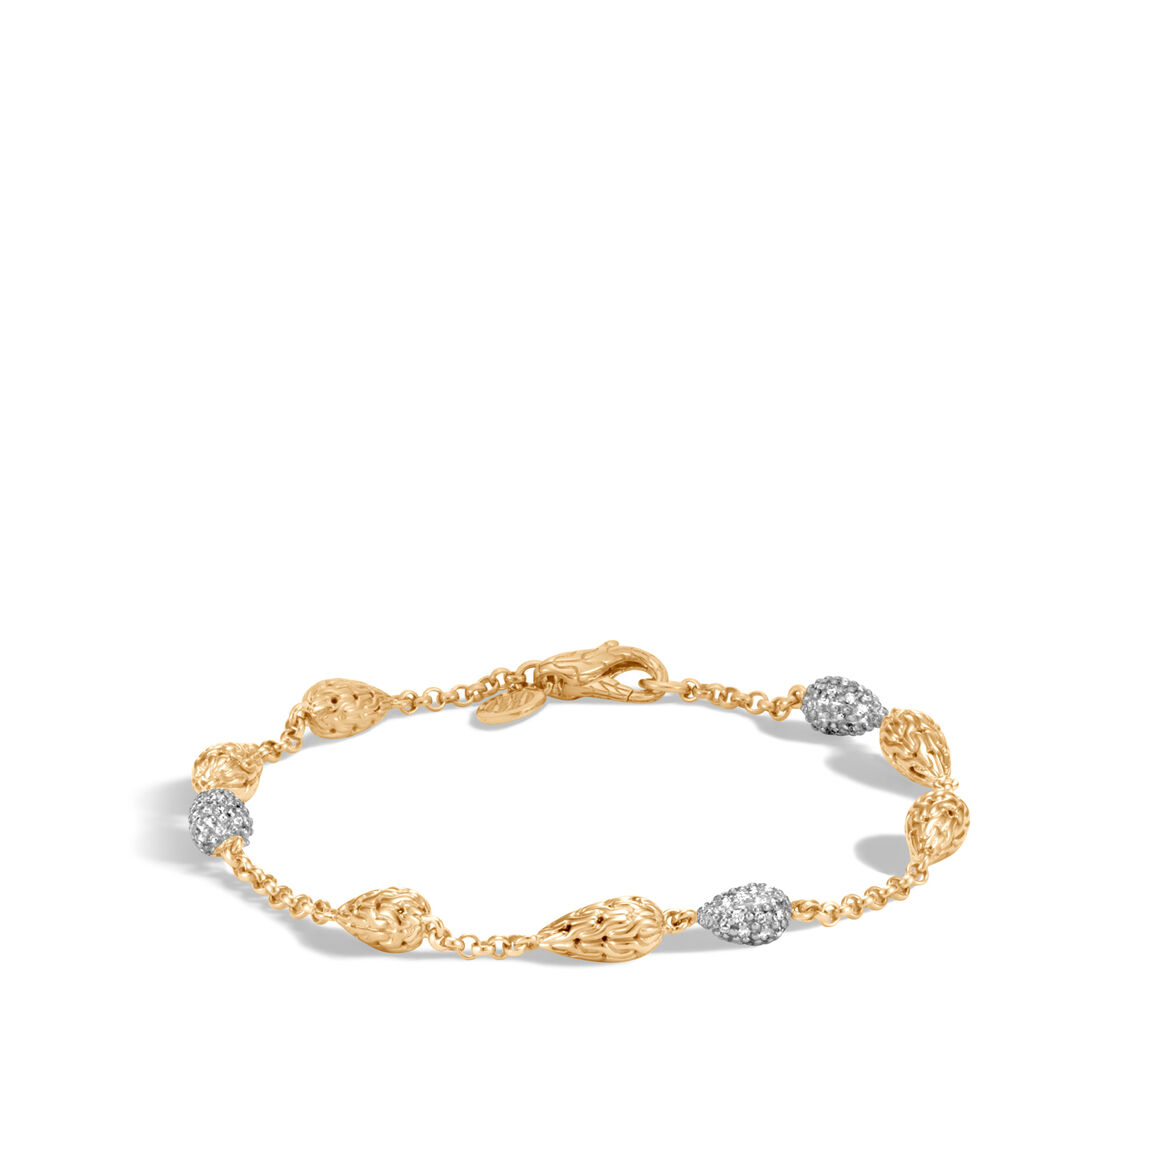 Classic Chain Station Bracelet in 18K Gold, Diamonds